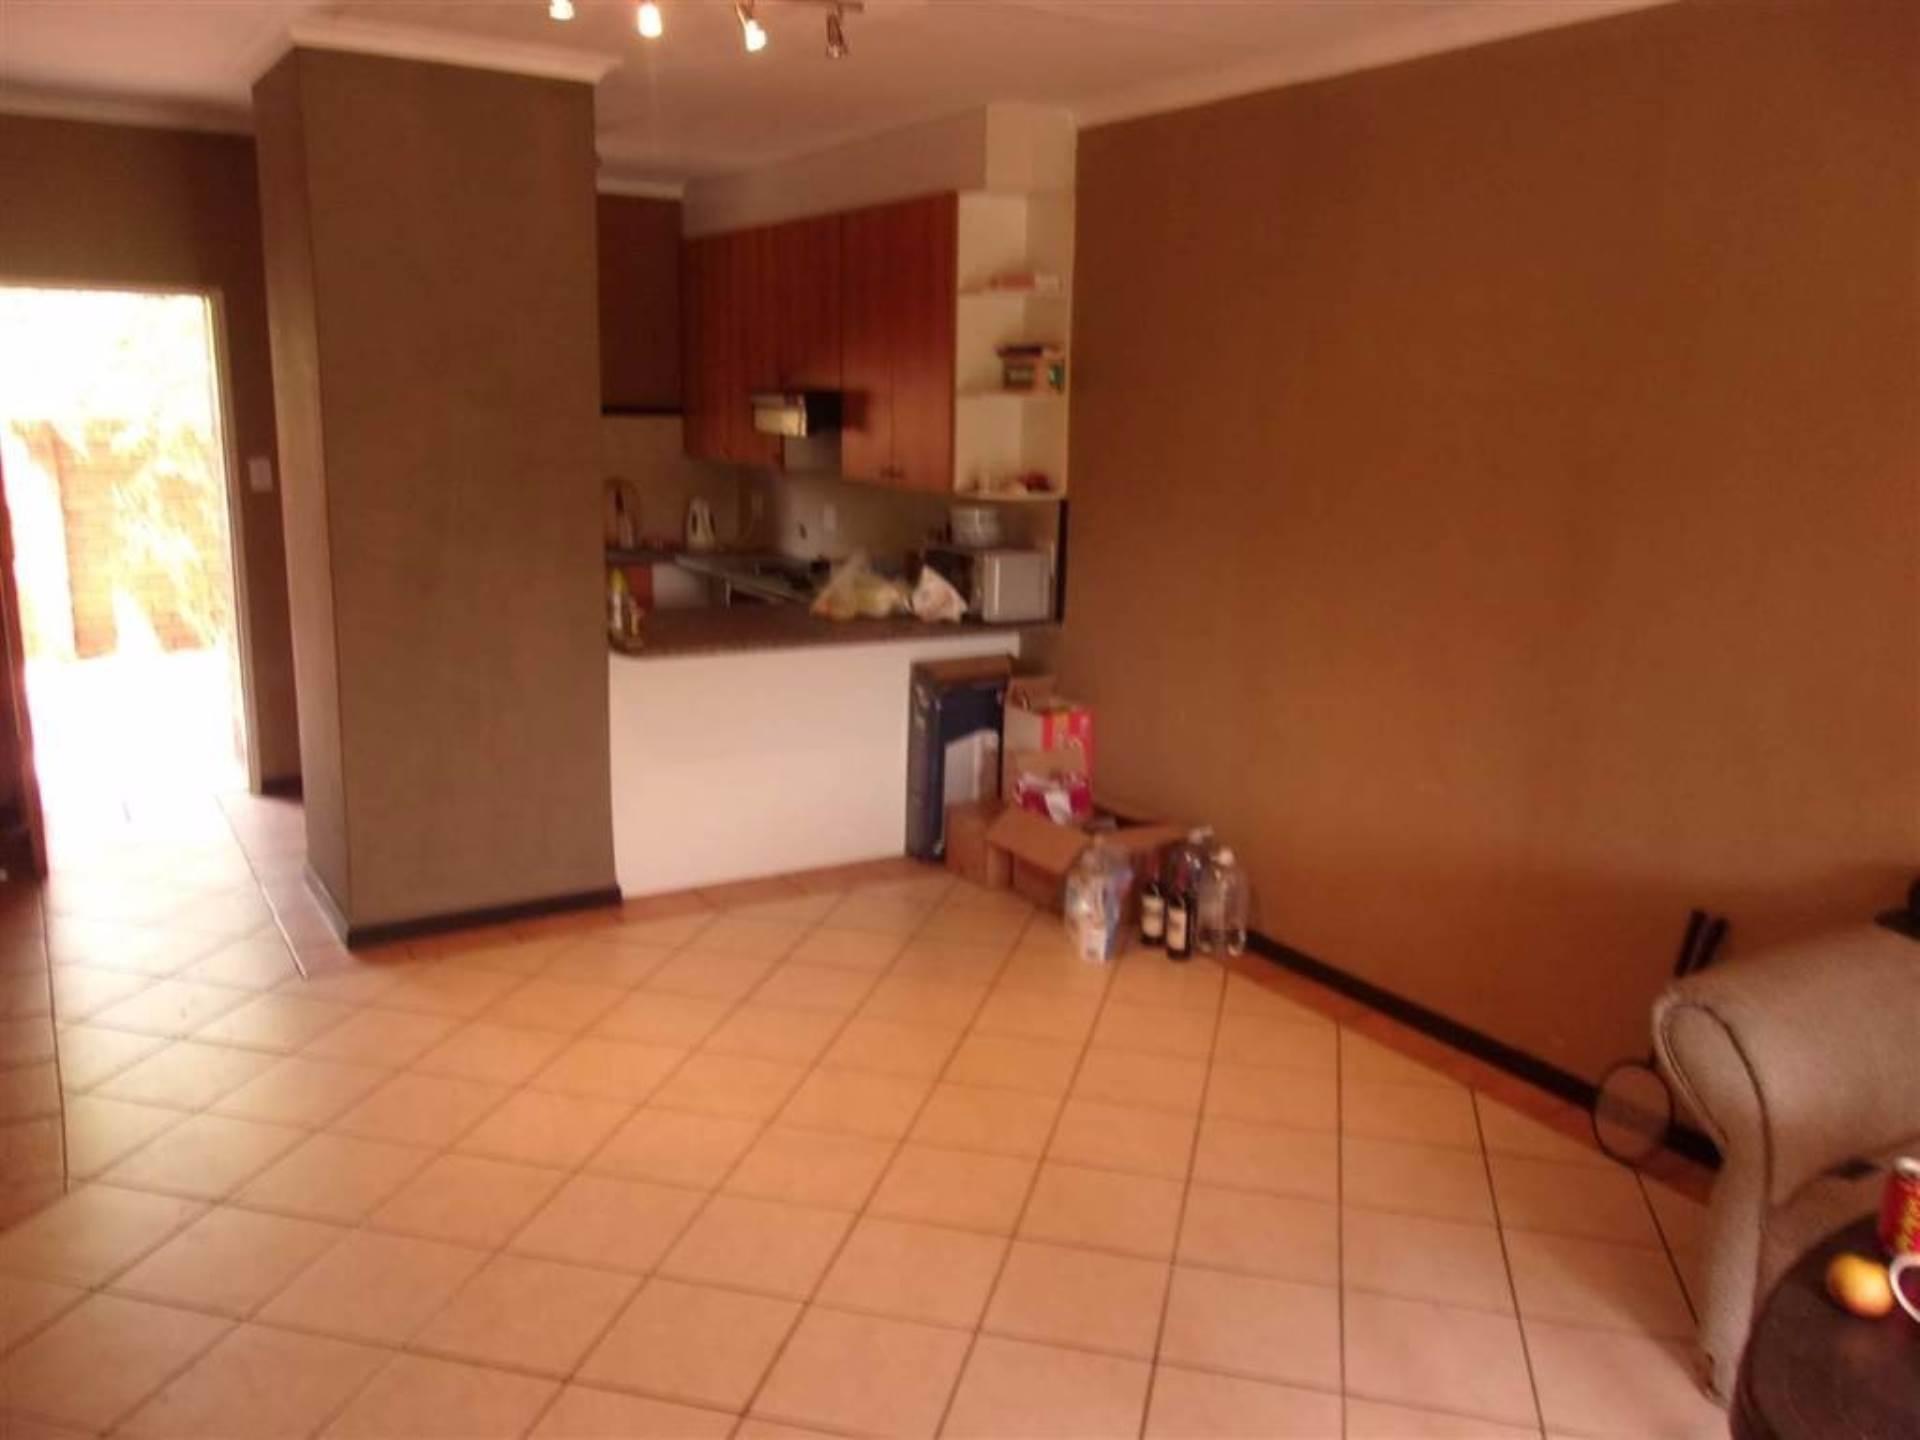 Eco Park property for sale. Ref No: 13546641. Picture no 5